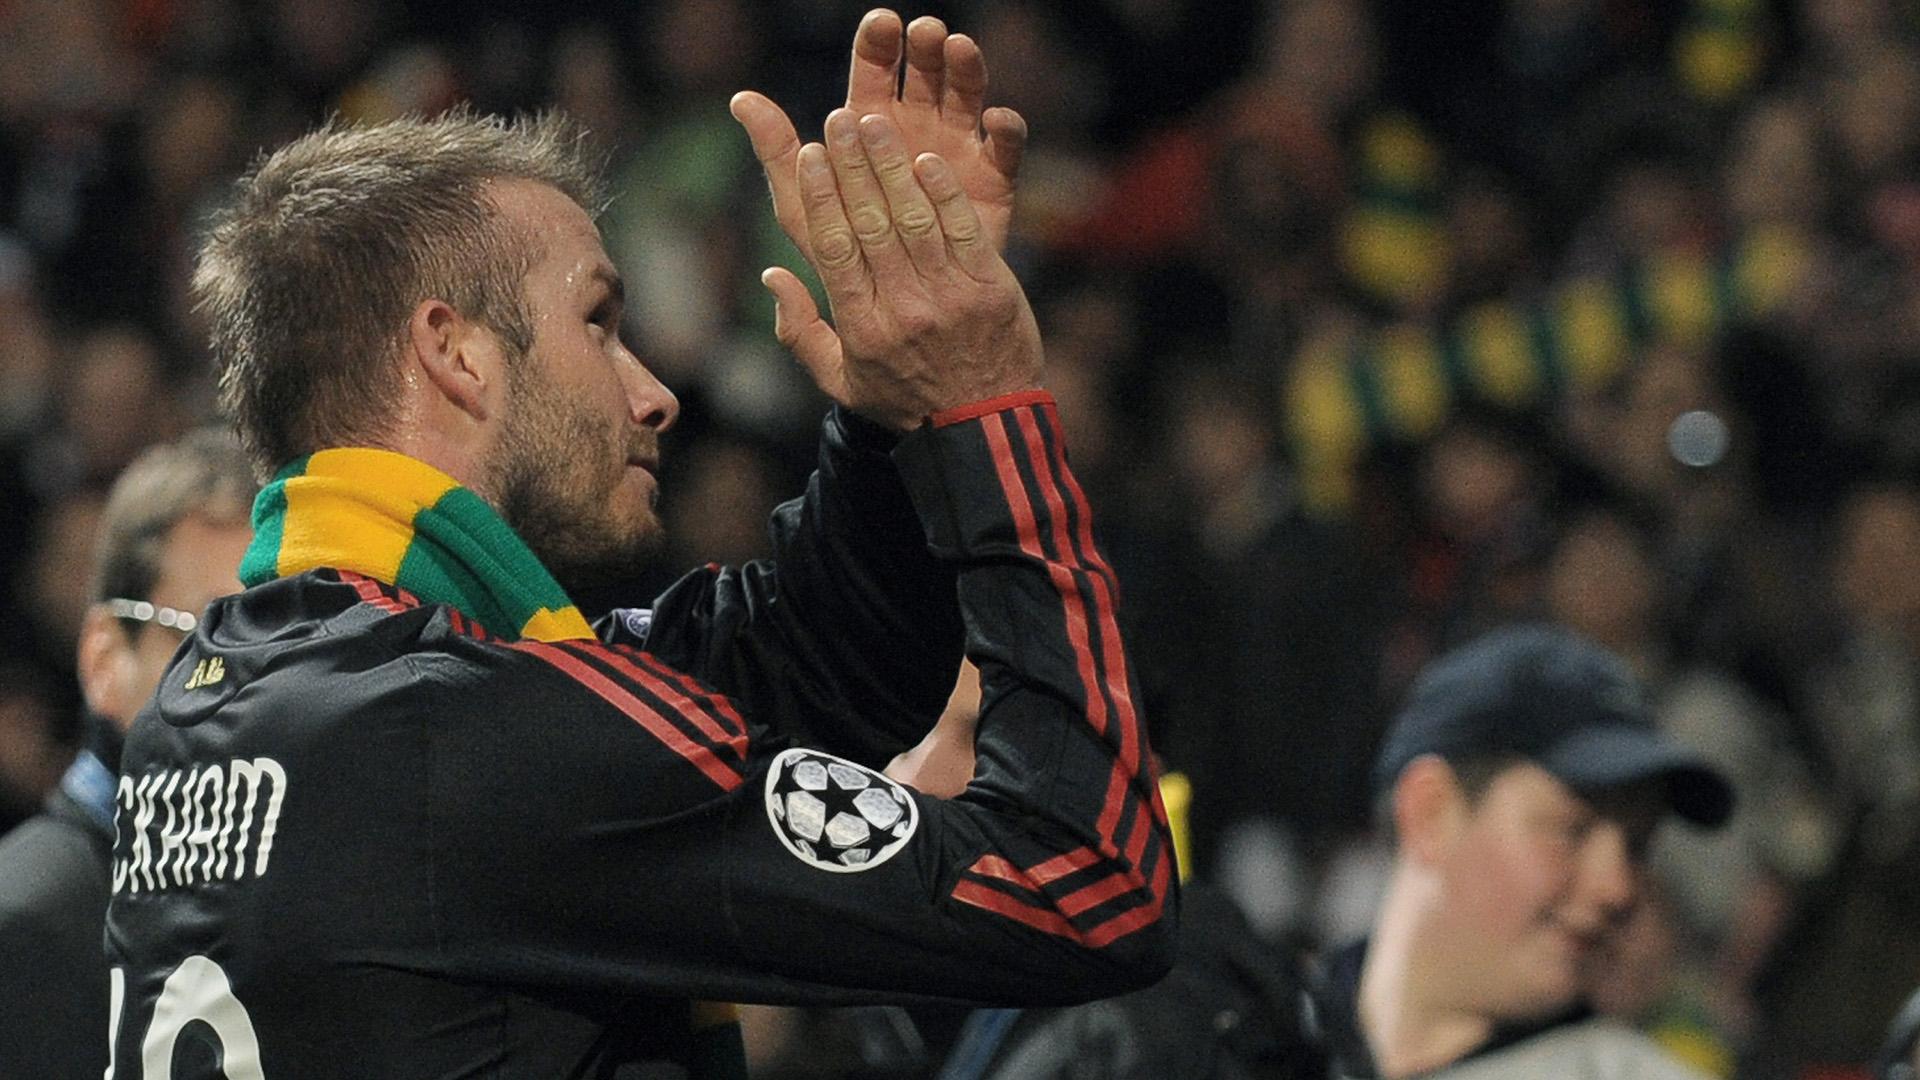 David Beckham AC Milan Manchester United 2010 Glazer scarf